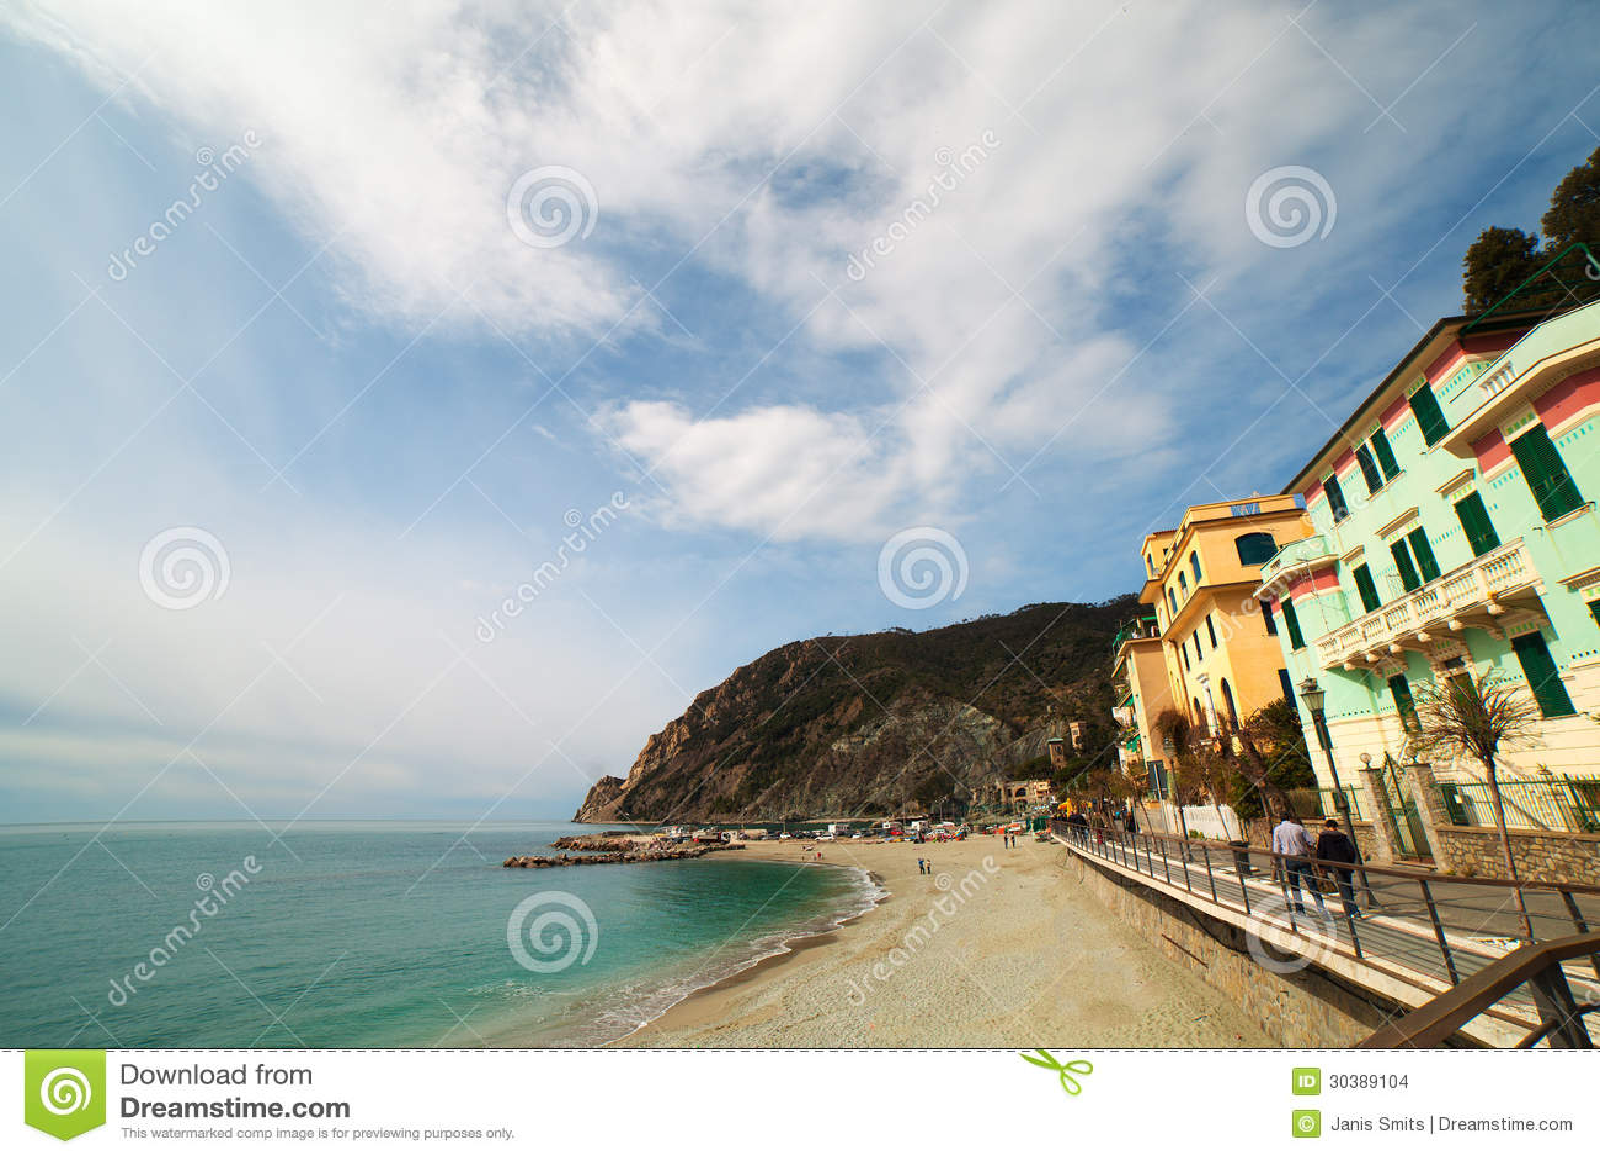 sea monterosso italy - photo #37